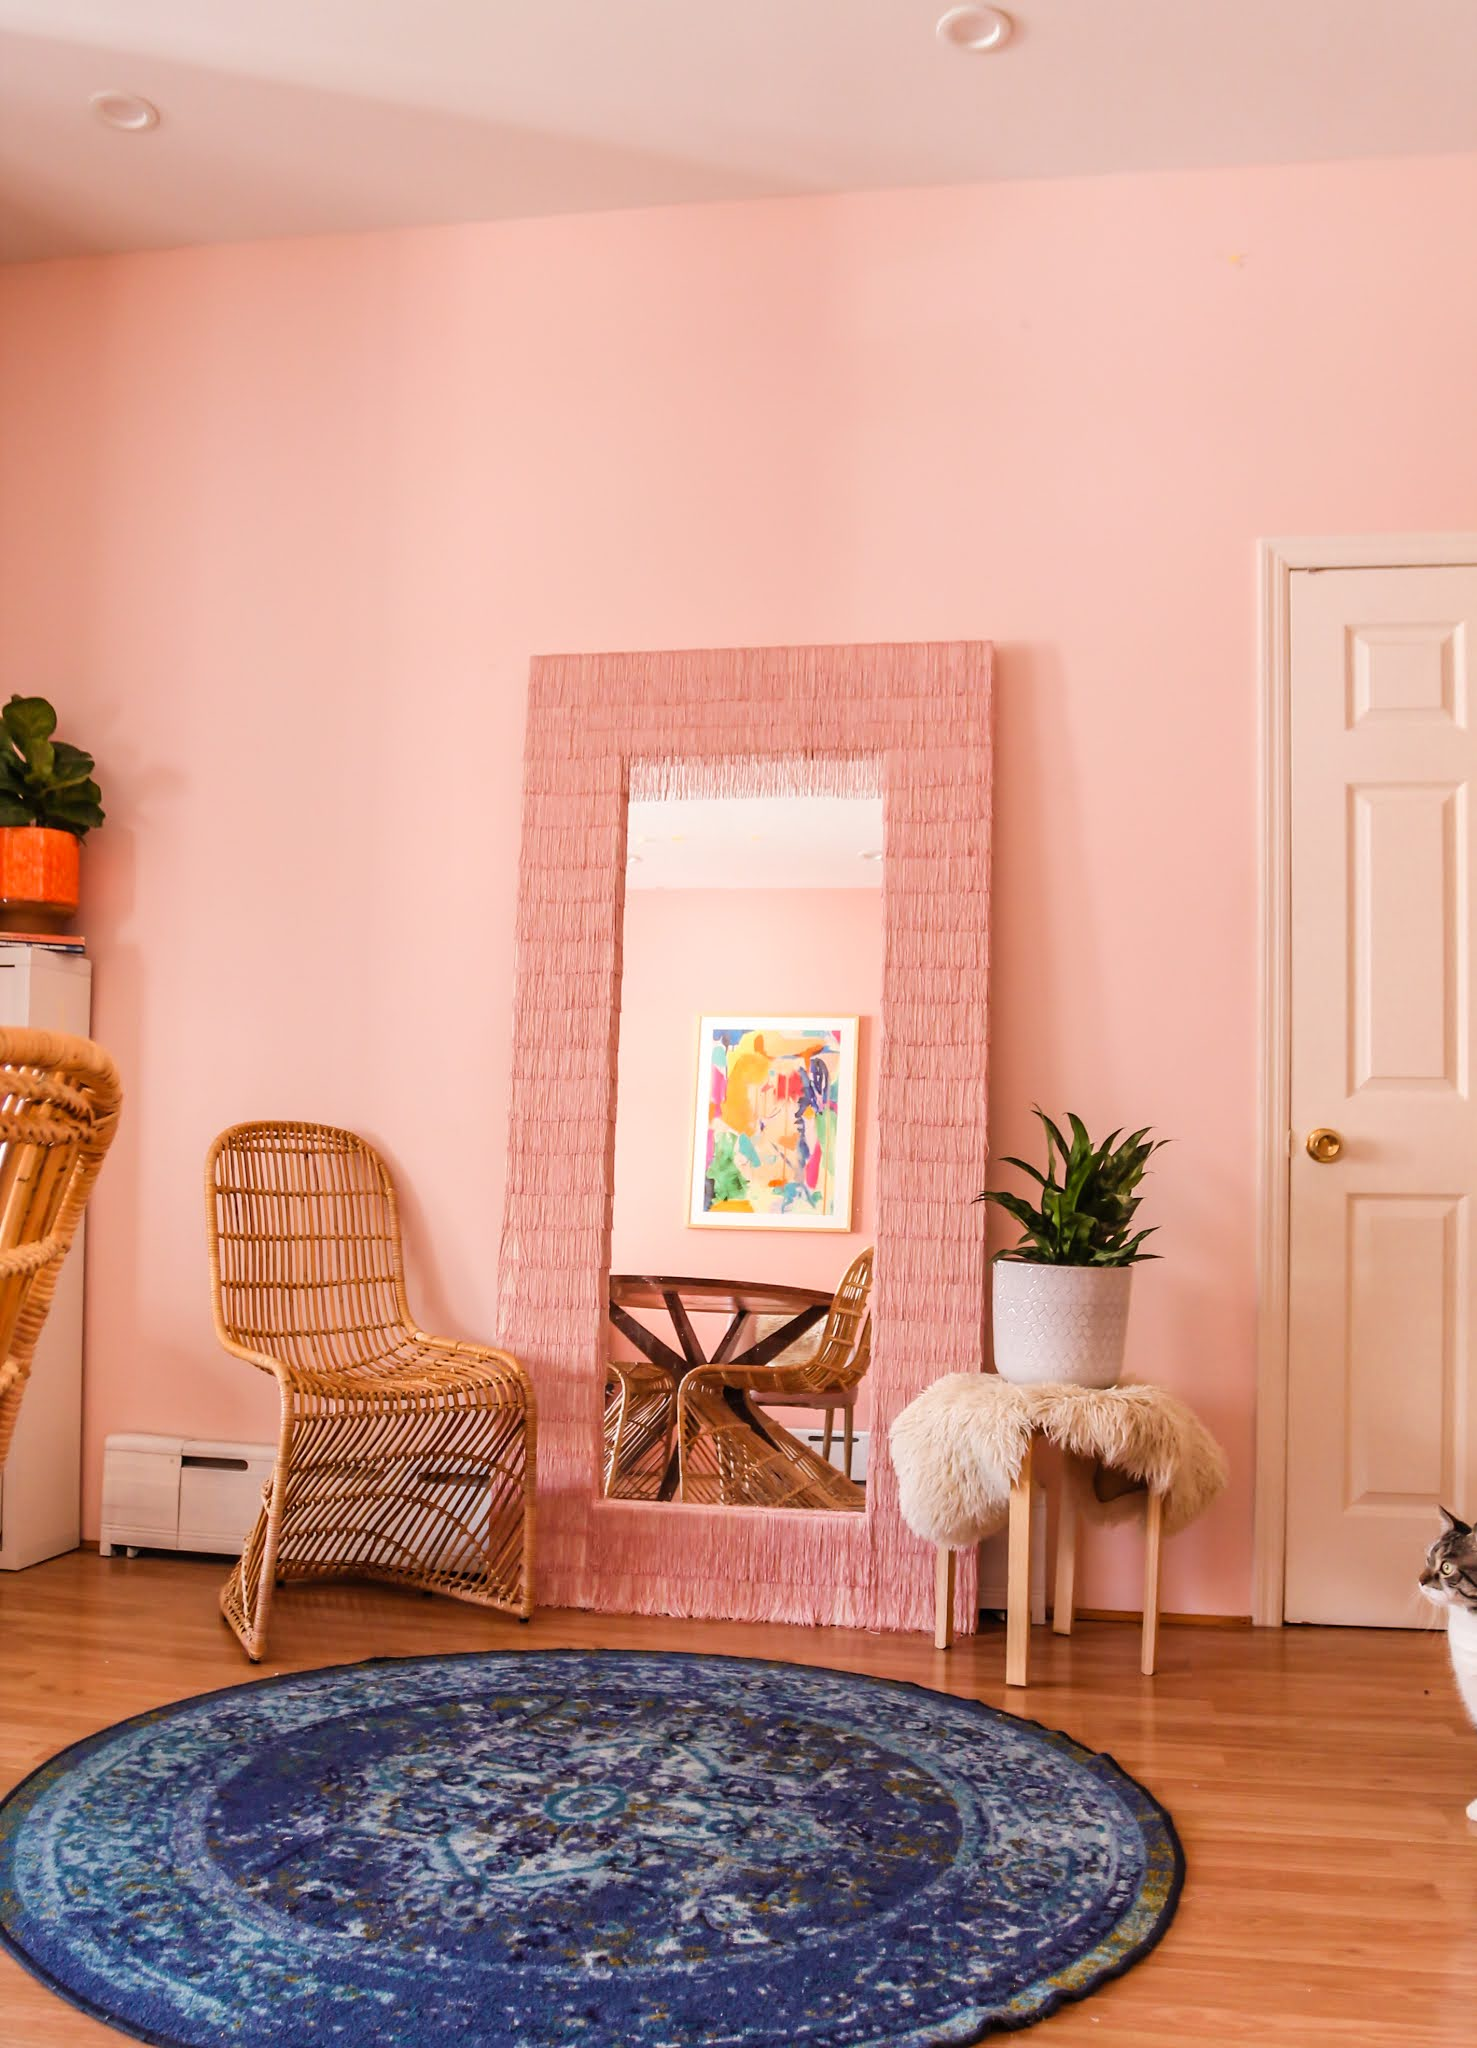 Ikea Hack // Ikea Mirror Hacks // Fringe Mirror // DIY fringe mirror // DIY floor length fringe mirror // floor length fringe mirror // pink fringe mirror // fringe diy // Megan Zietz // tfdiaries // easy ikea mirror epicycle // easy ikea mirror hack // easy ikea hacks // colorful homes // pink mirror // diy pink mirror // fringe mirror tutorial // budget friendly mirror diy // ikea mongstad mirror diy // ikea mongstad mirror hack // ikea mongstad // floor length mirror diys